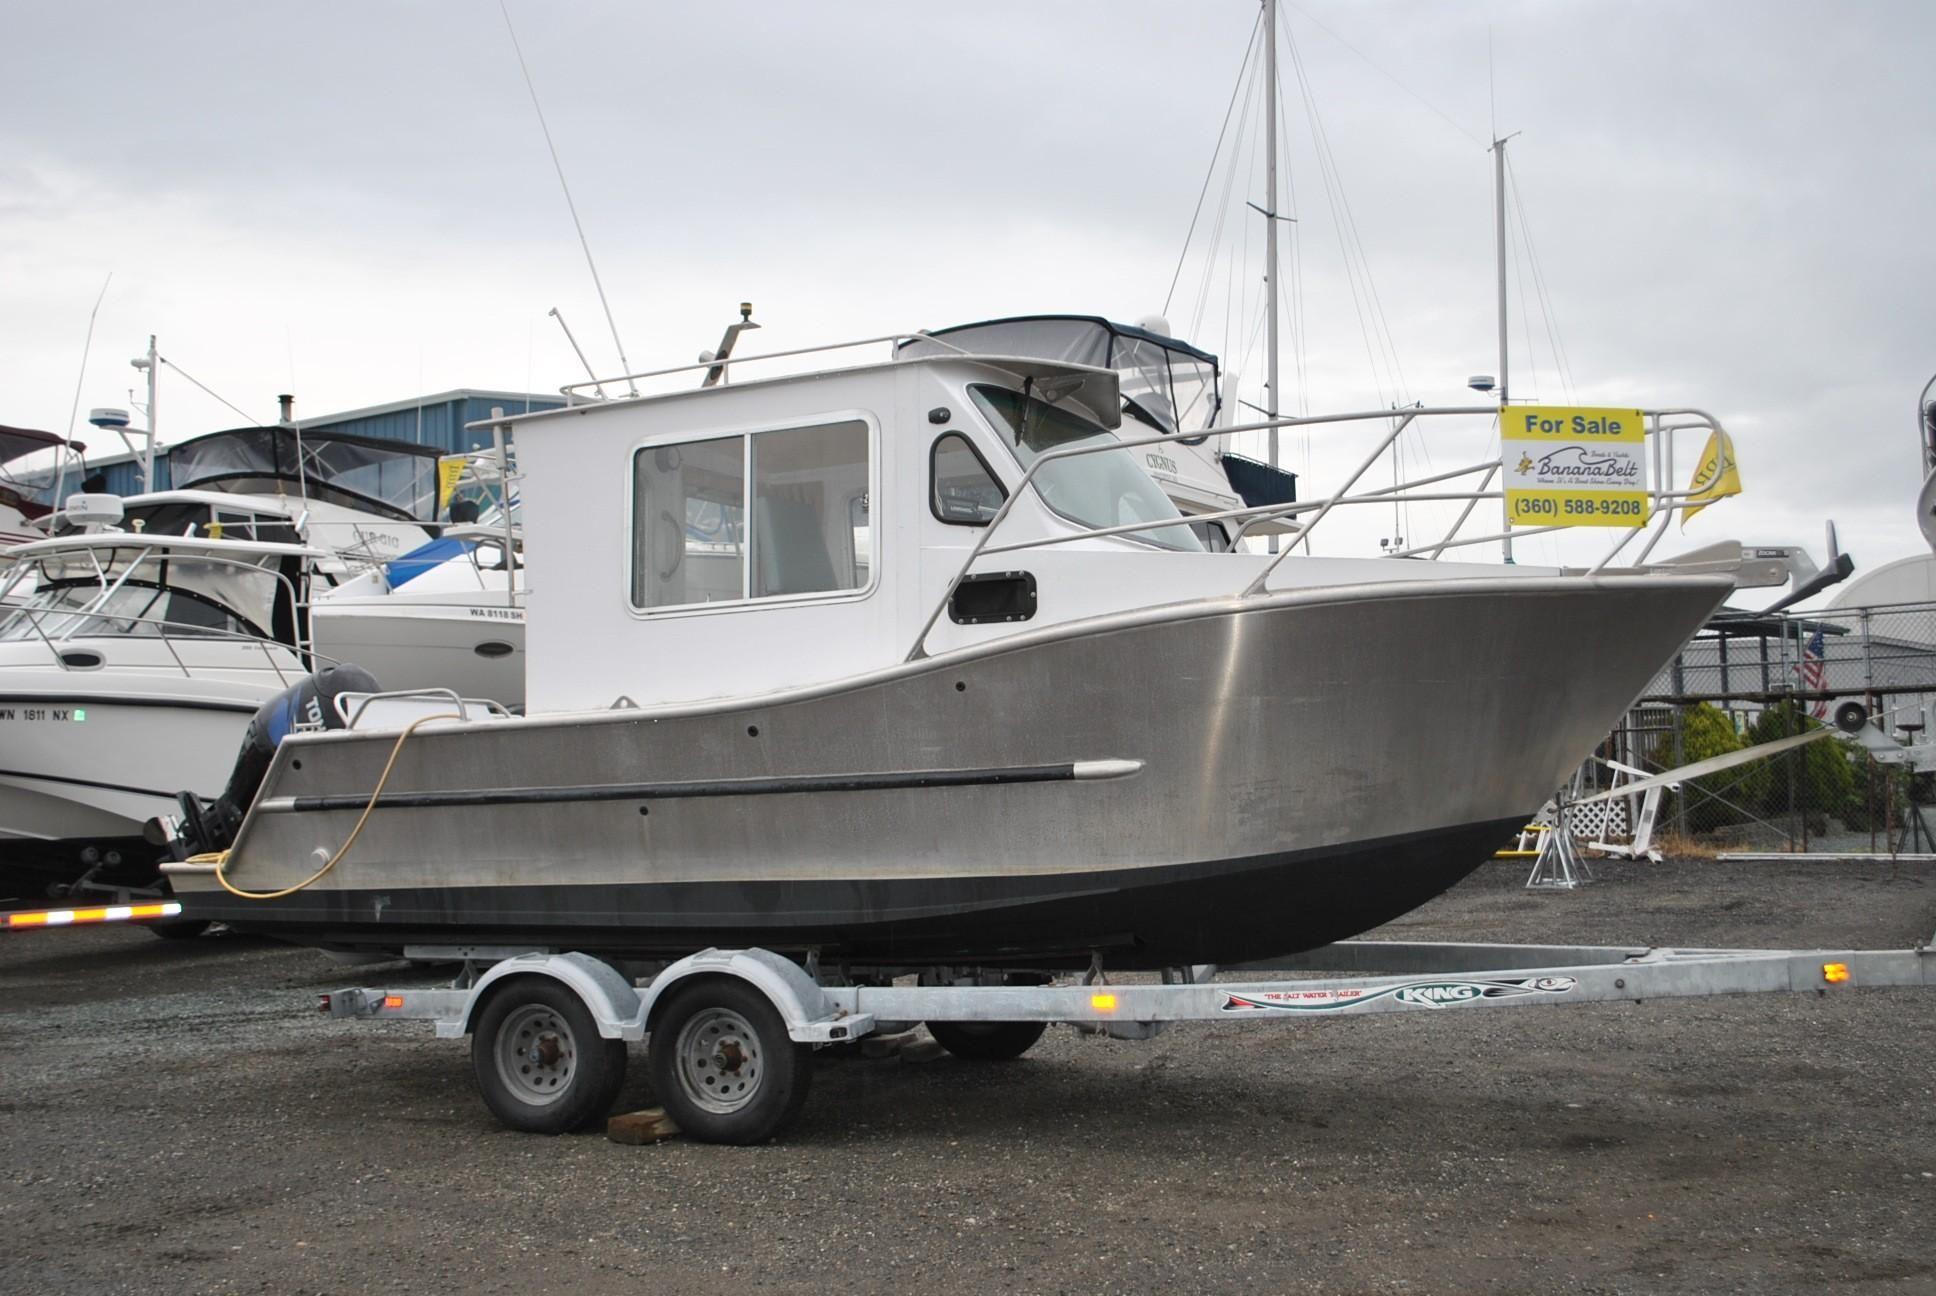 2016 Custom 24 Aluminum Pocket Cruiser Motor Båt til salgs